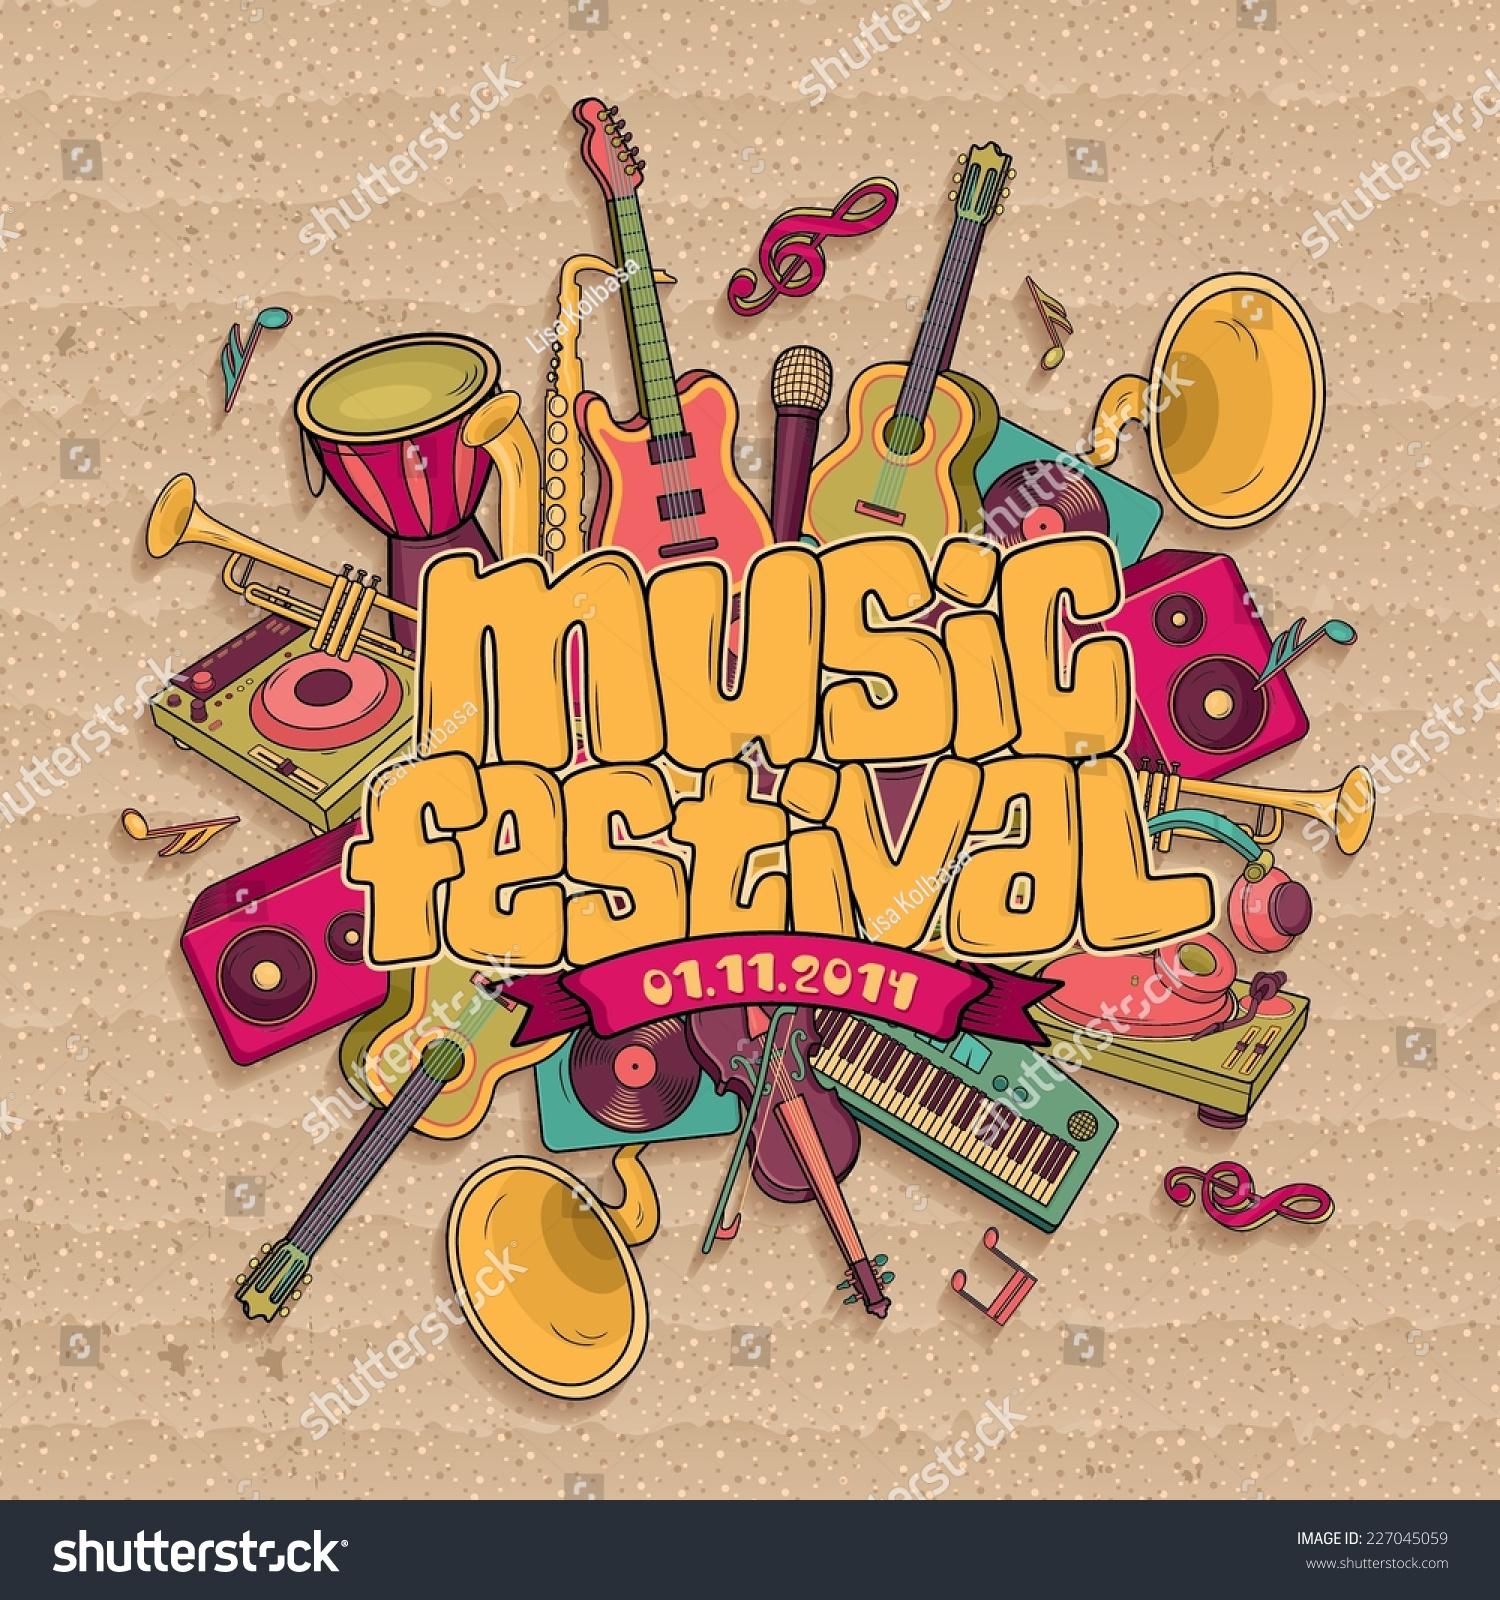 Music Festival Vector Music Background Stock Vector ...